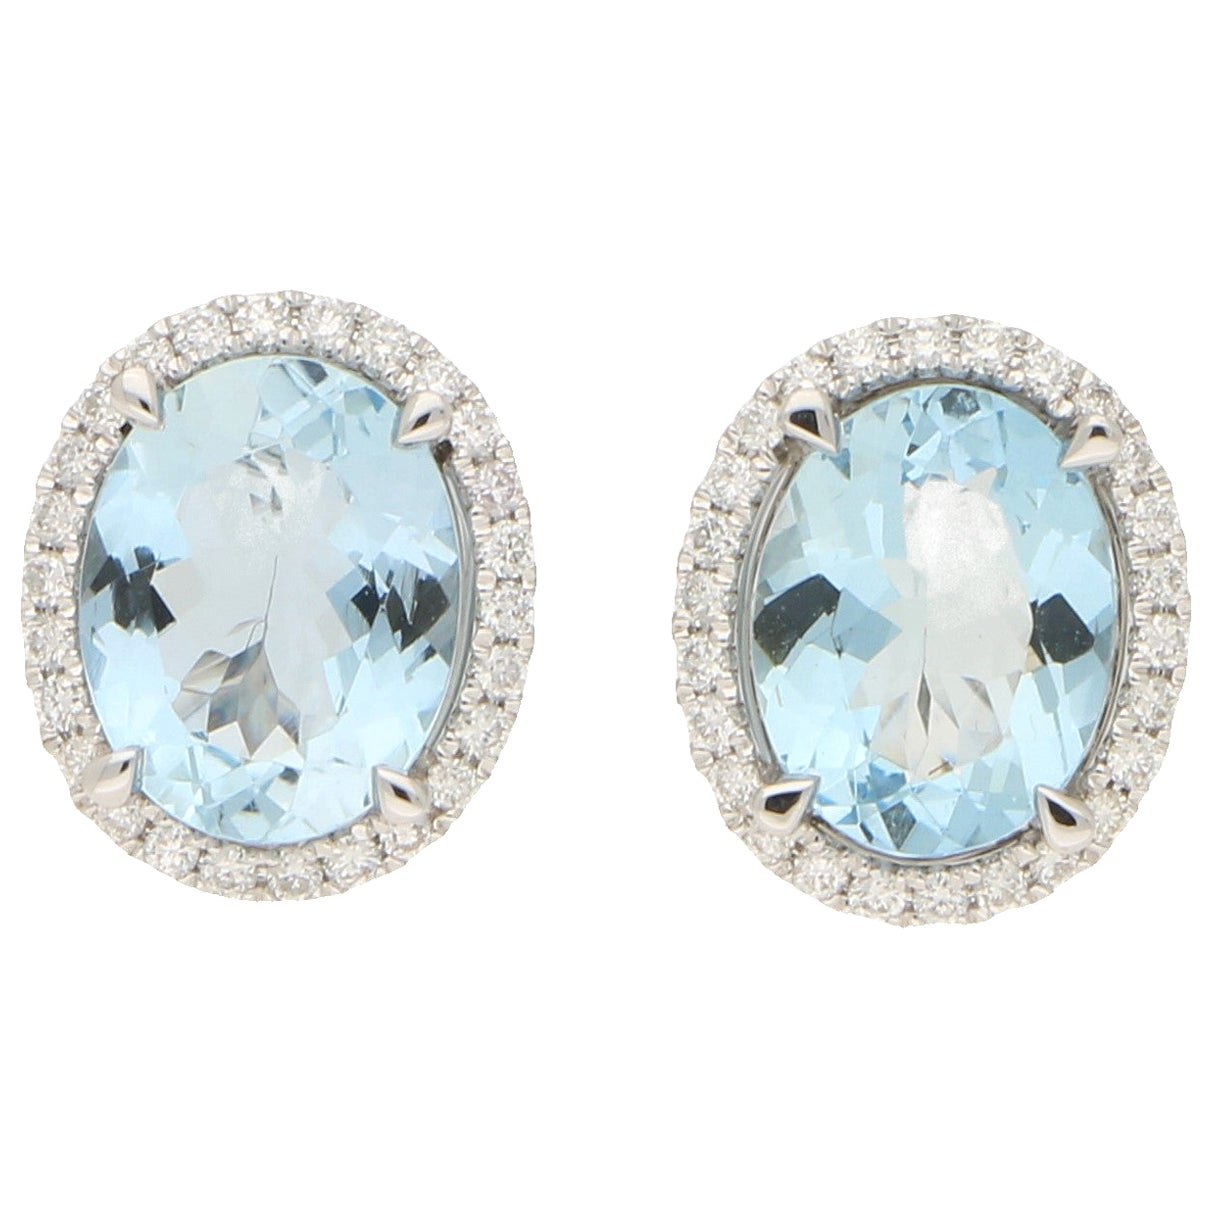 Large Aquamarine and Diamond Cluster Halo Earrings Set in 18 Karat White Gold